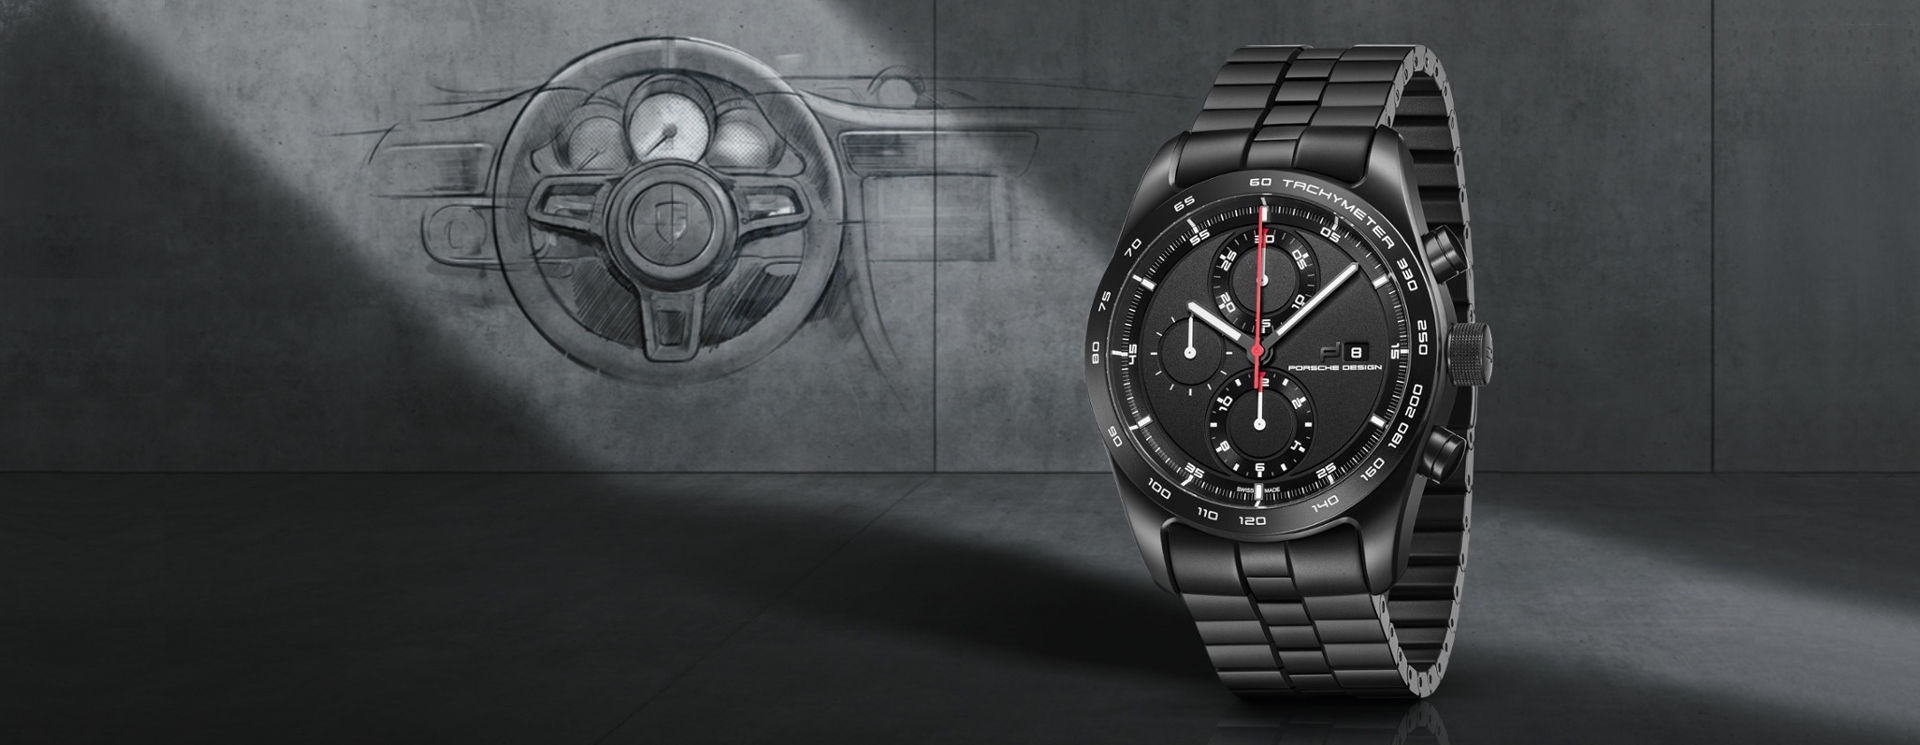 Porsche Design Chronotimer Kollektion